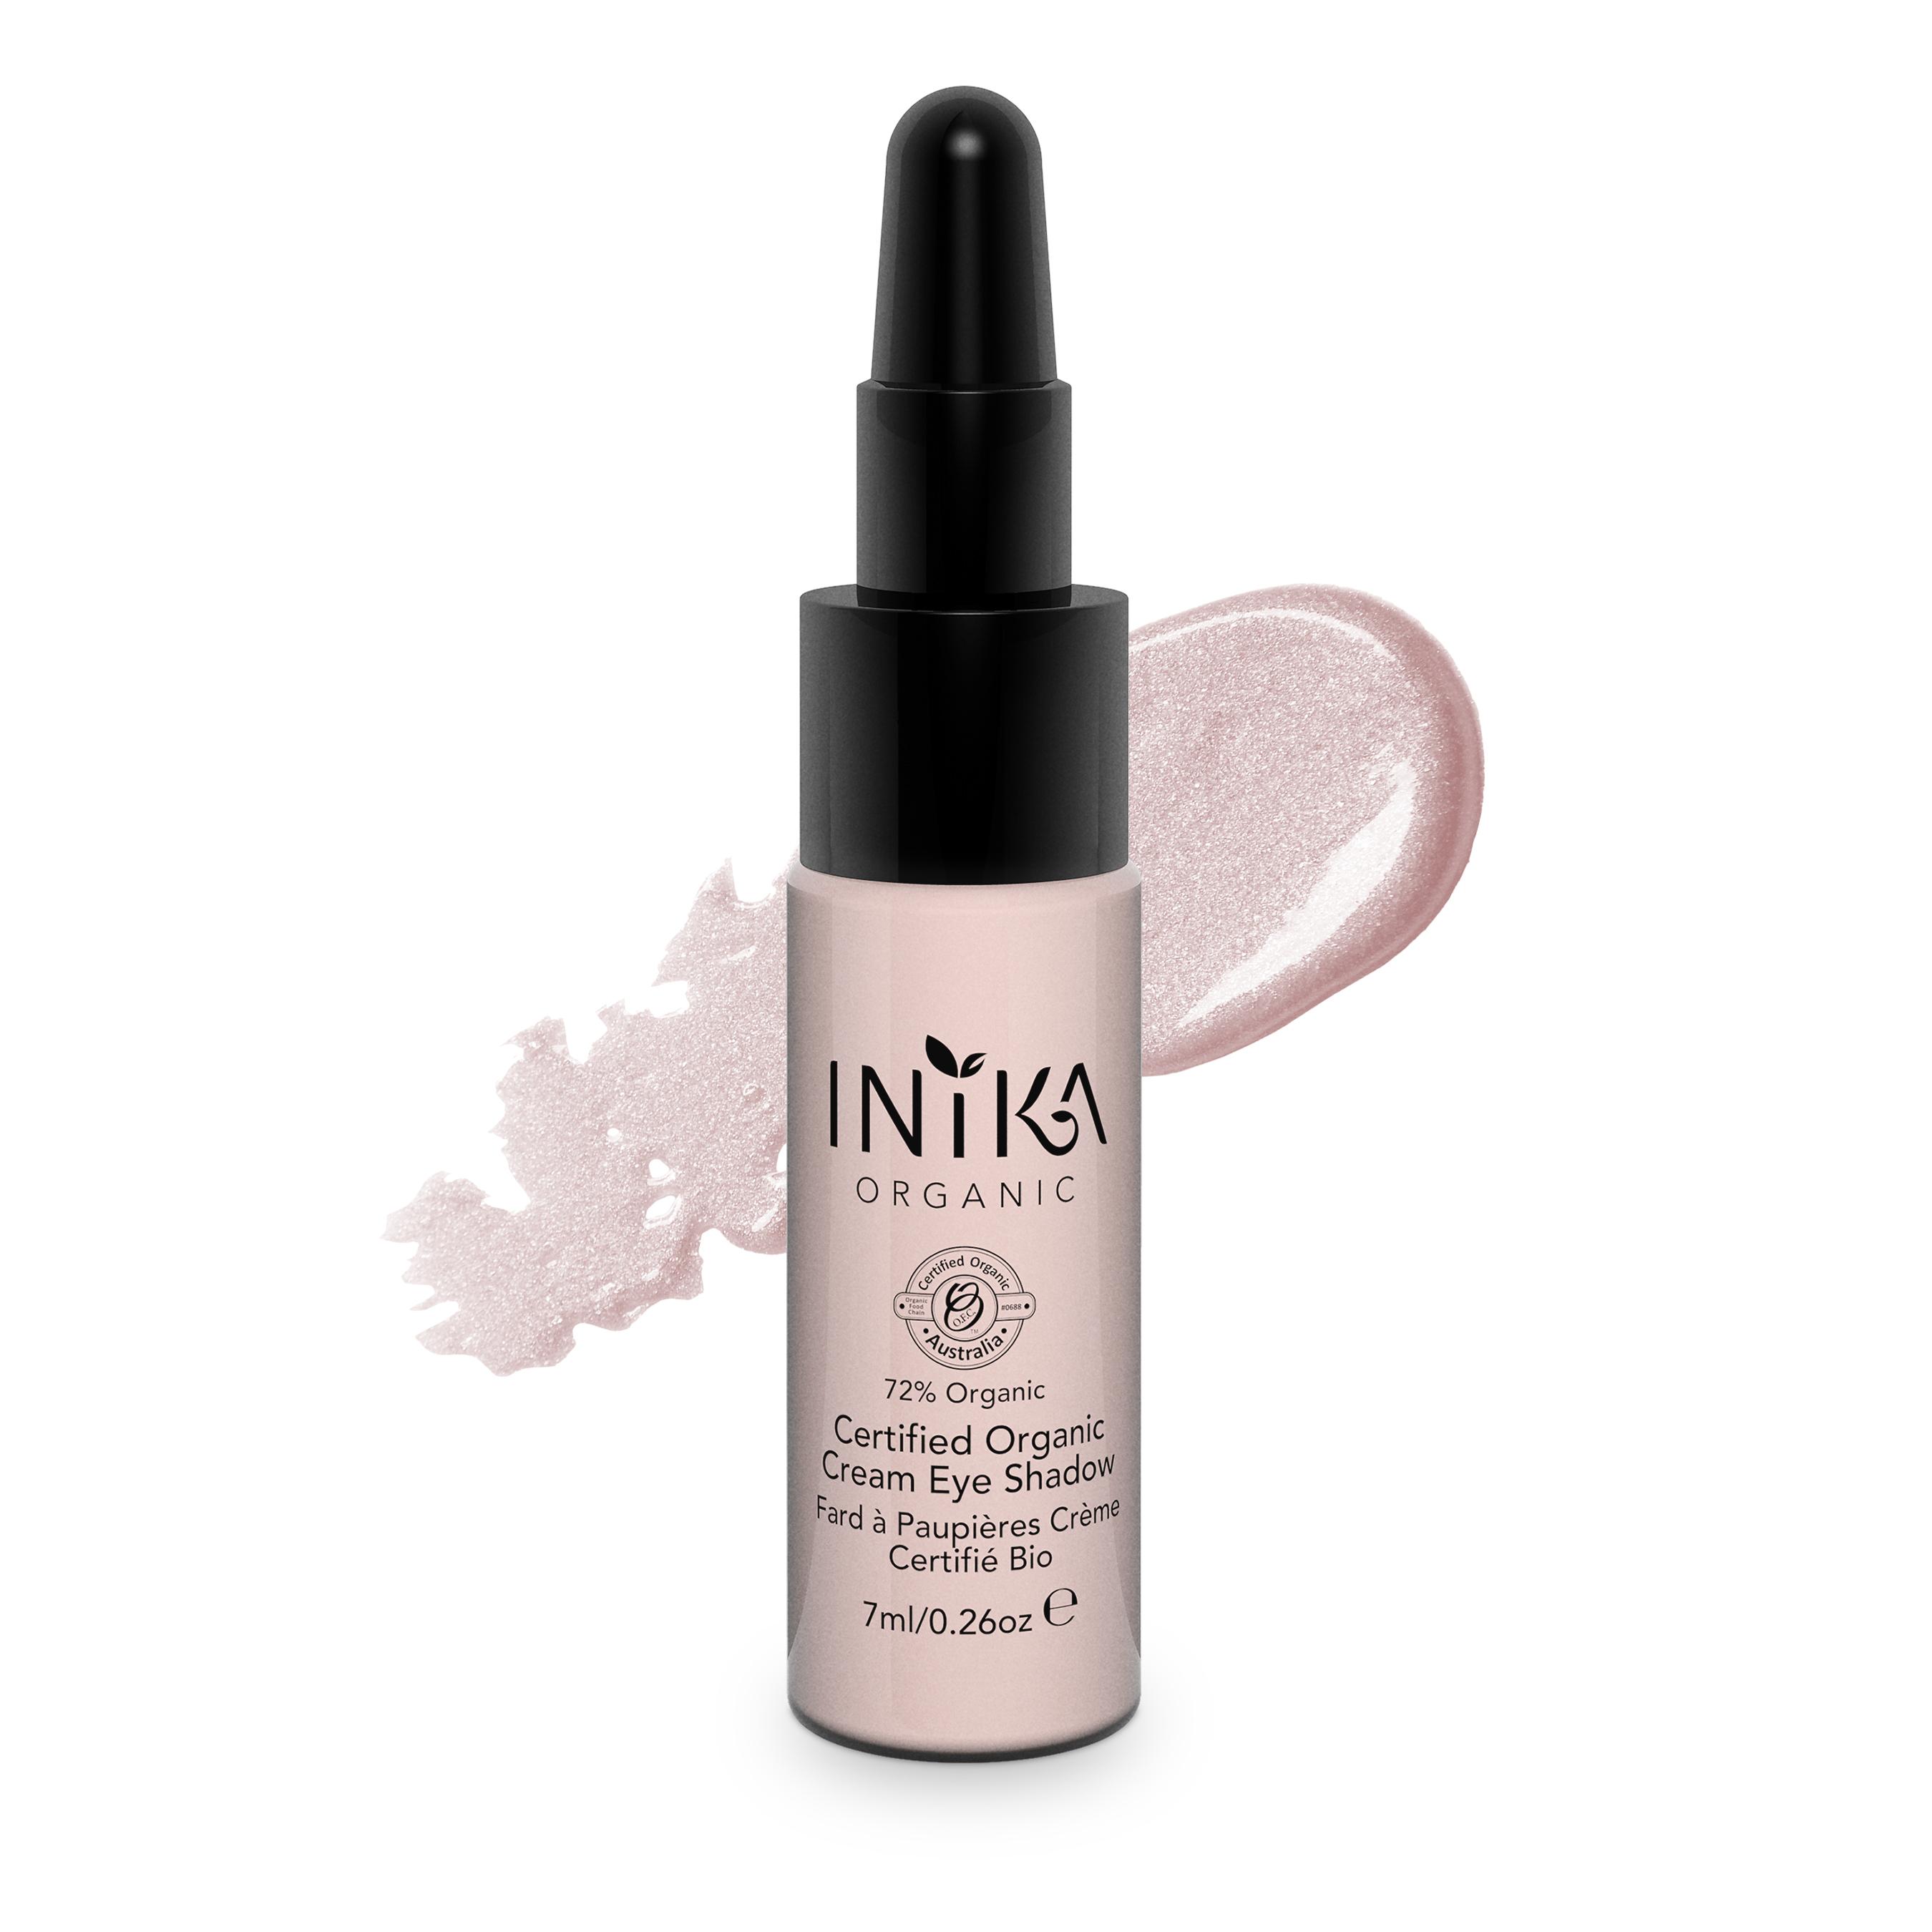 INIKA Certified Organic Cream Eye Shadow 7ml Pink Cloud With Product